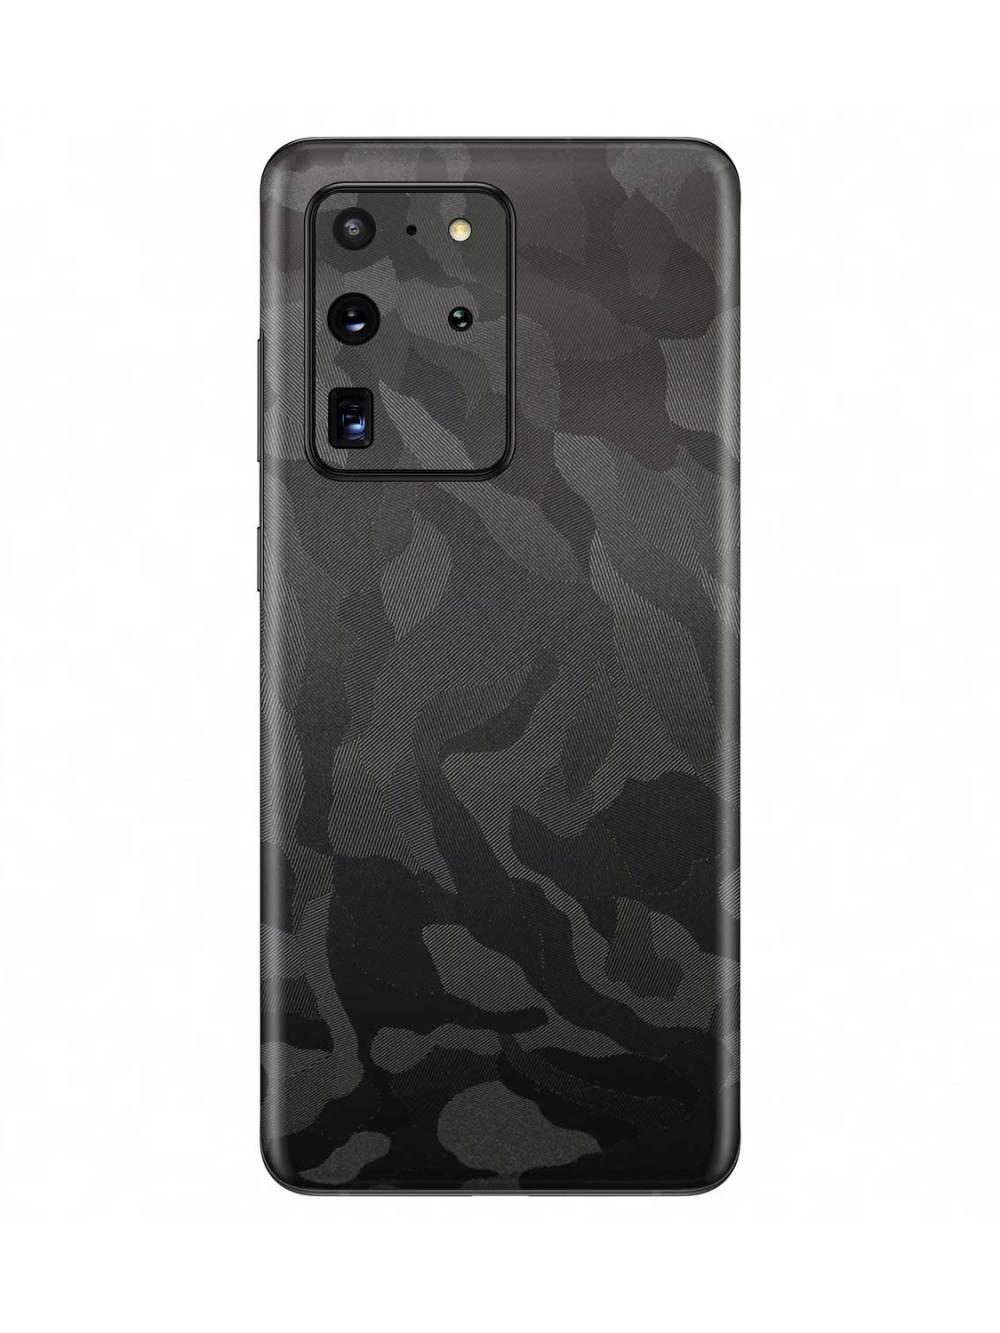 3M Black Camo Shadow Skin for Samsung Galaxy S20 Ultra